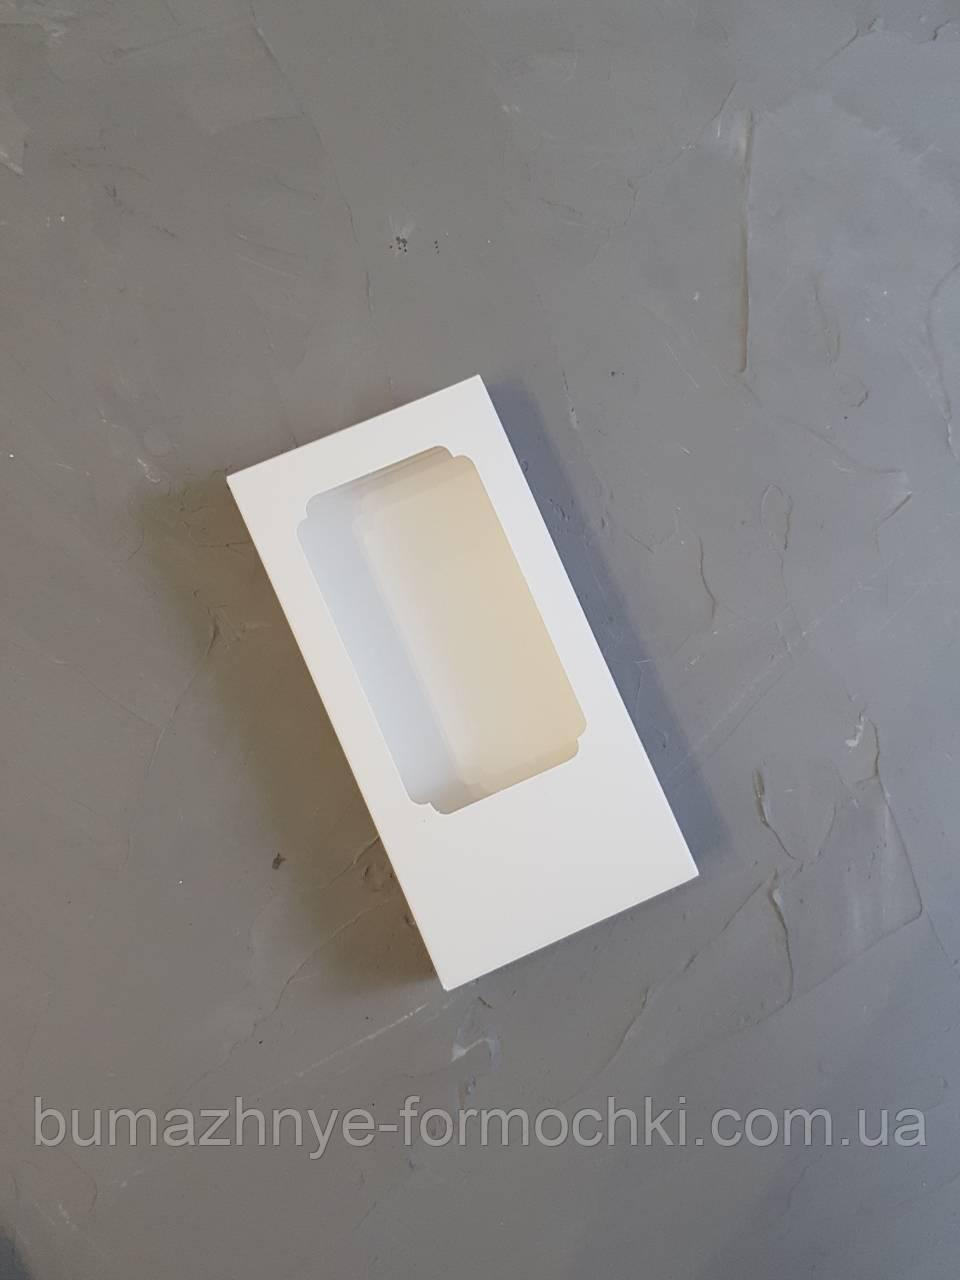 Коробка для шоколада, белый, 160*80*17, фото 1